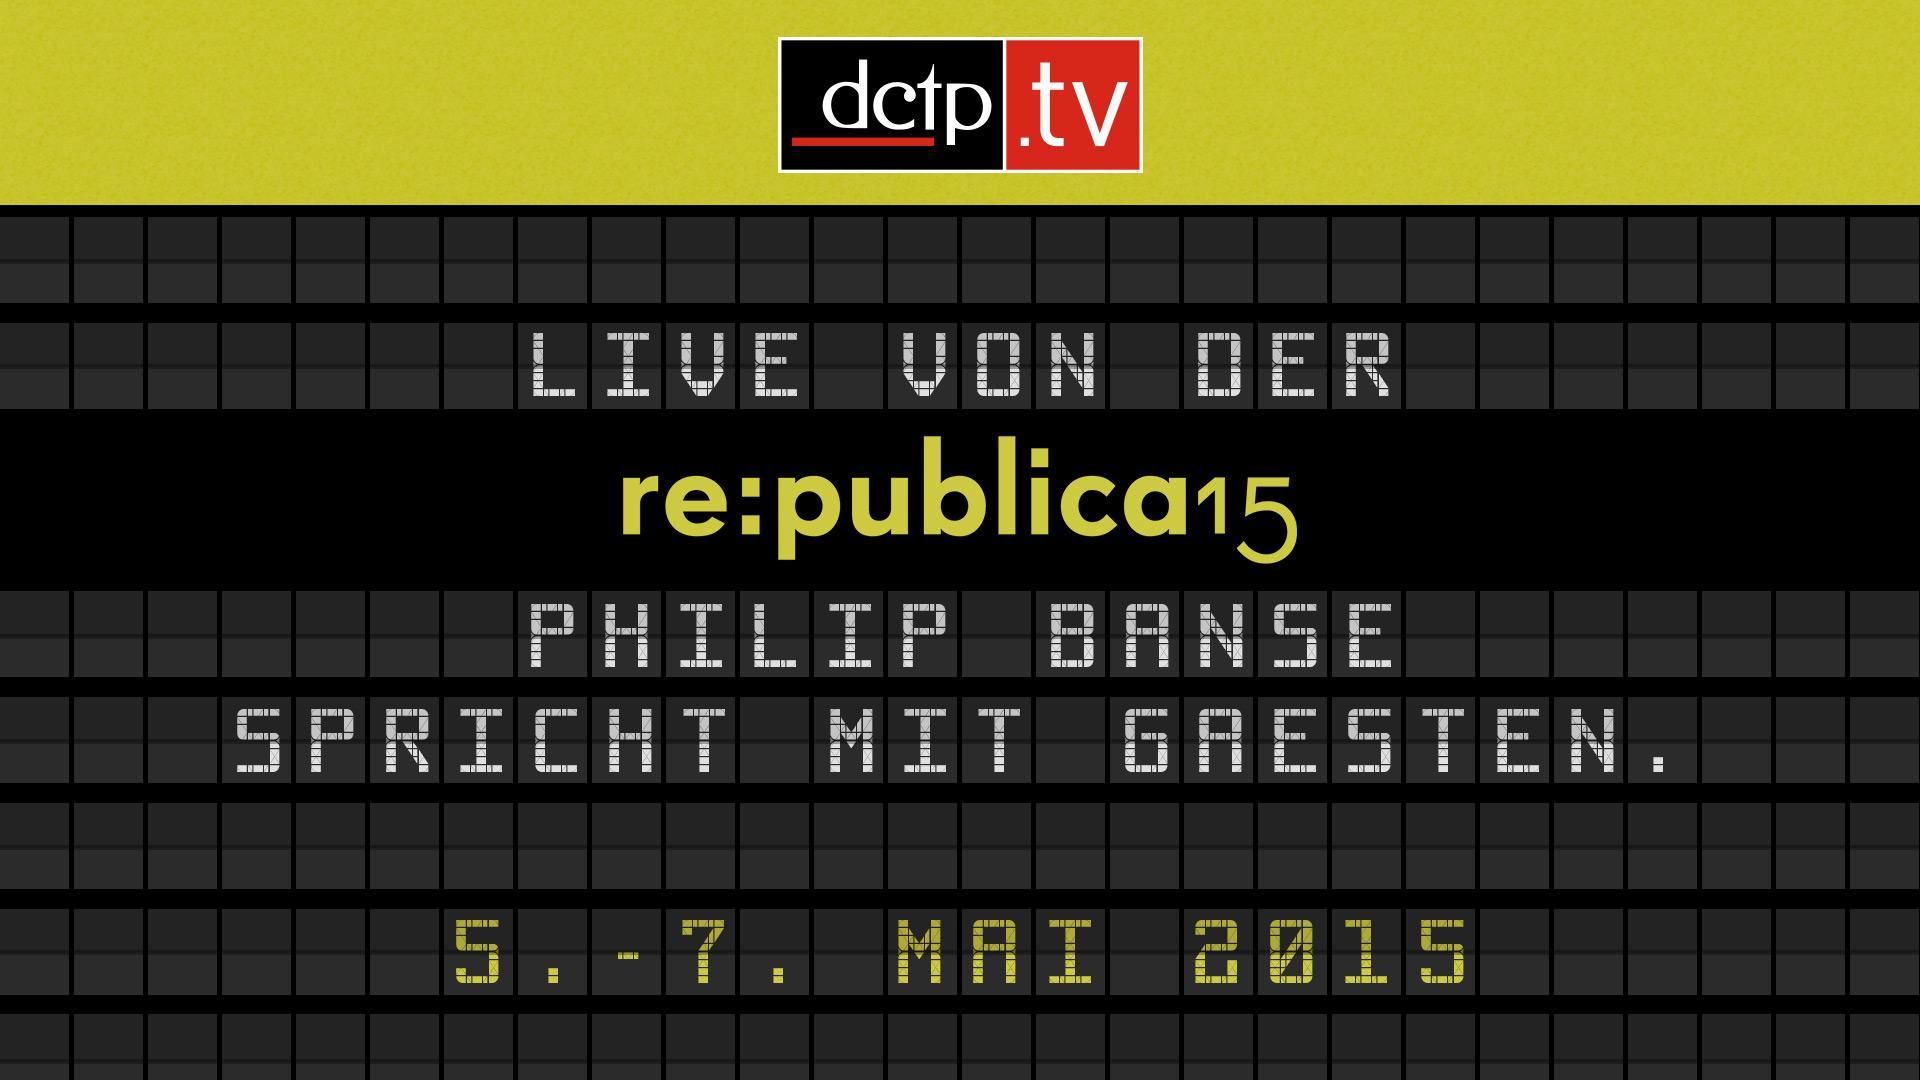 rp15_dctp_start